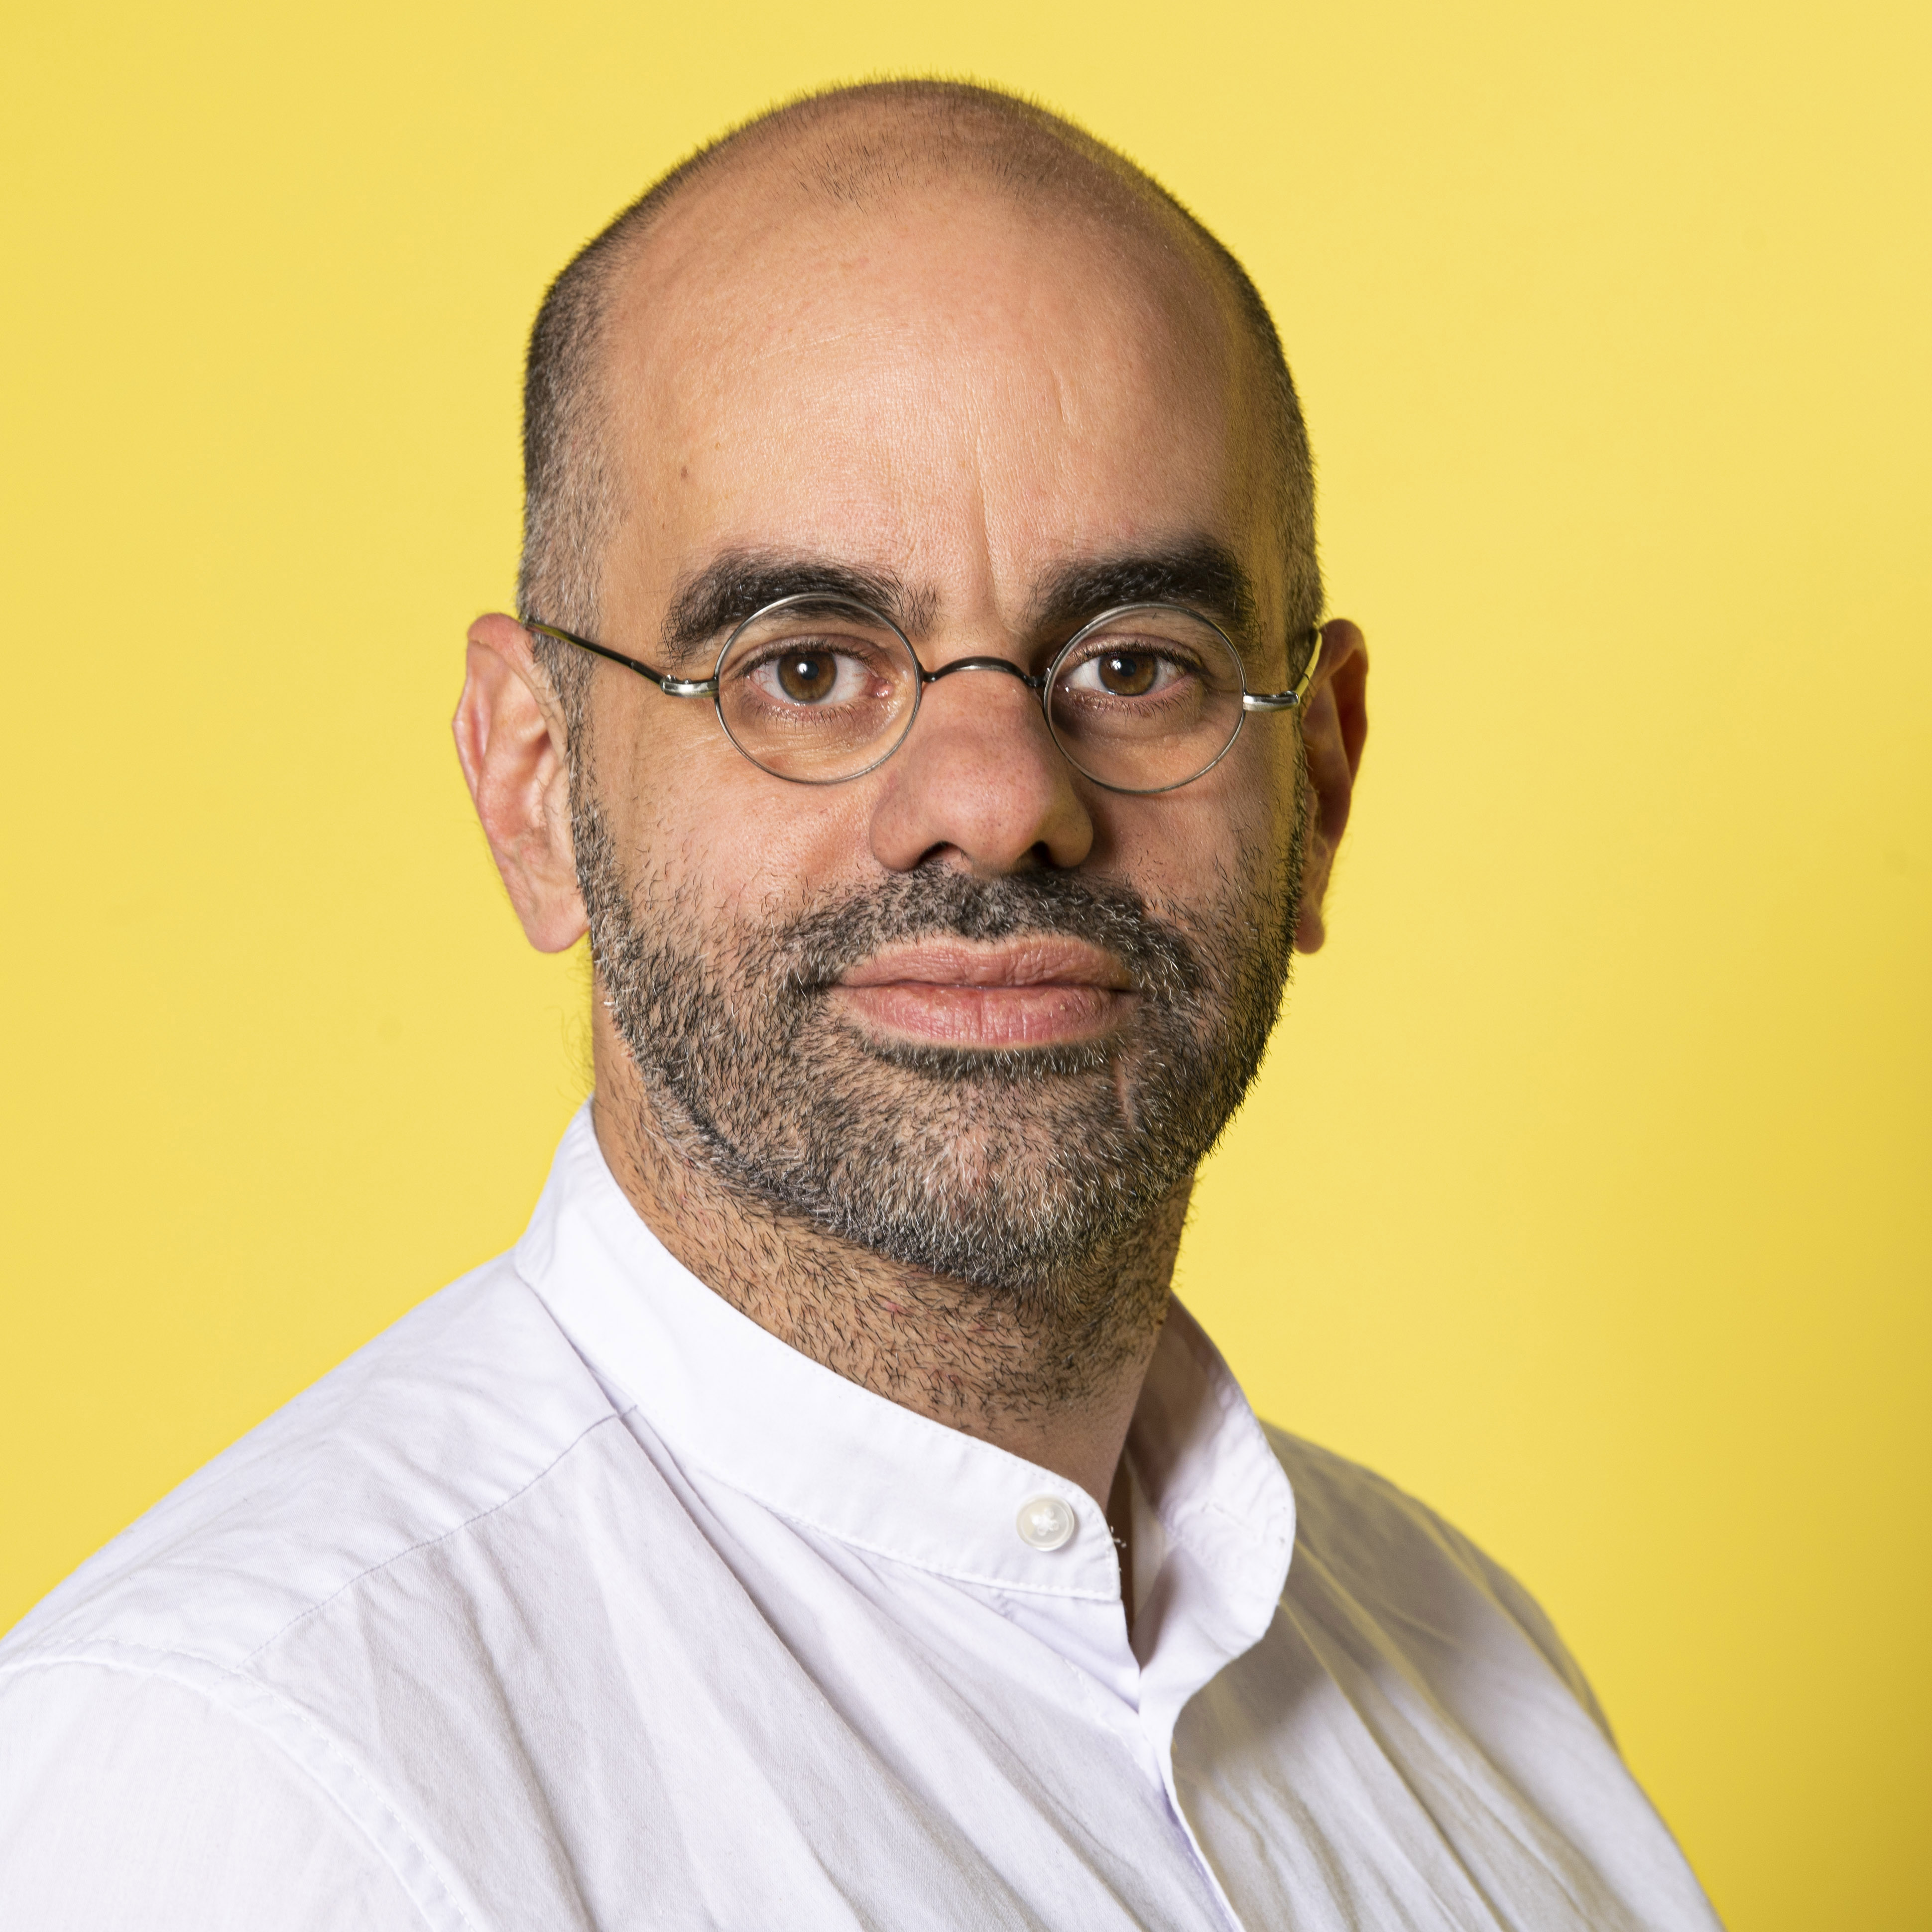 Dr. Patric Seibert-Wolf